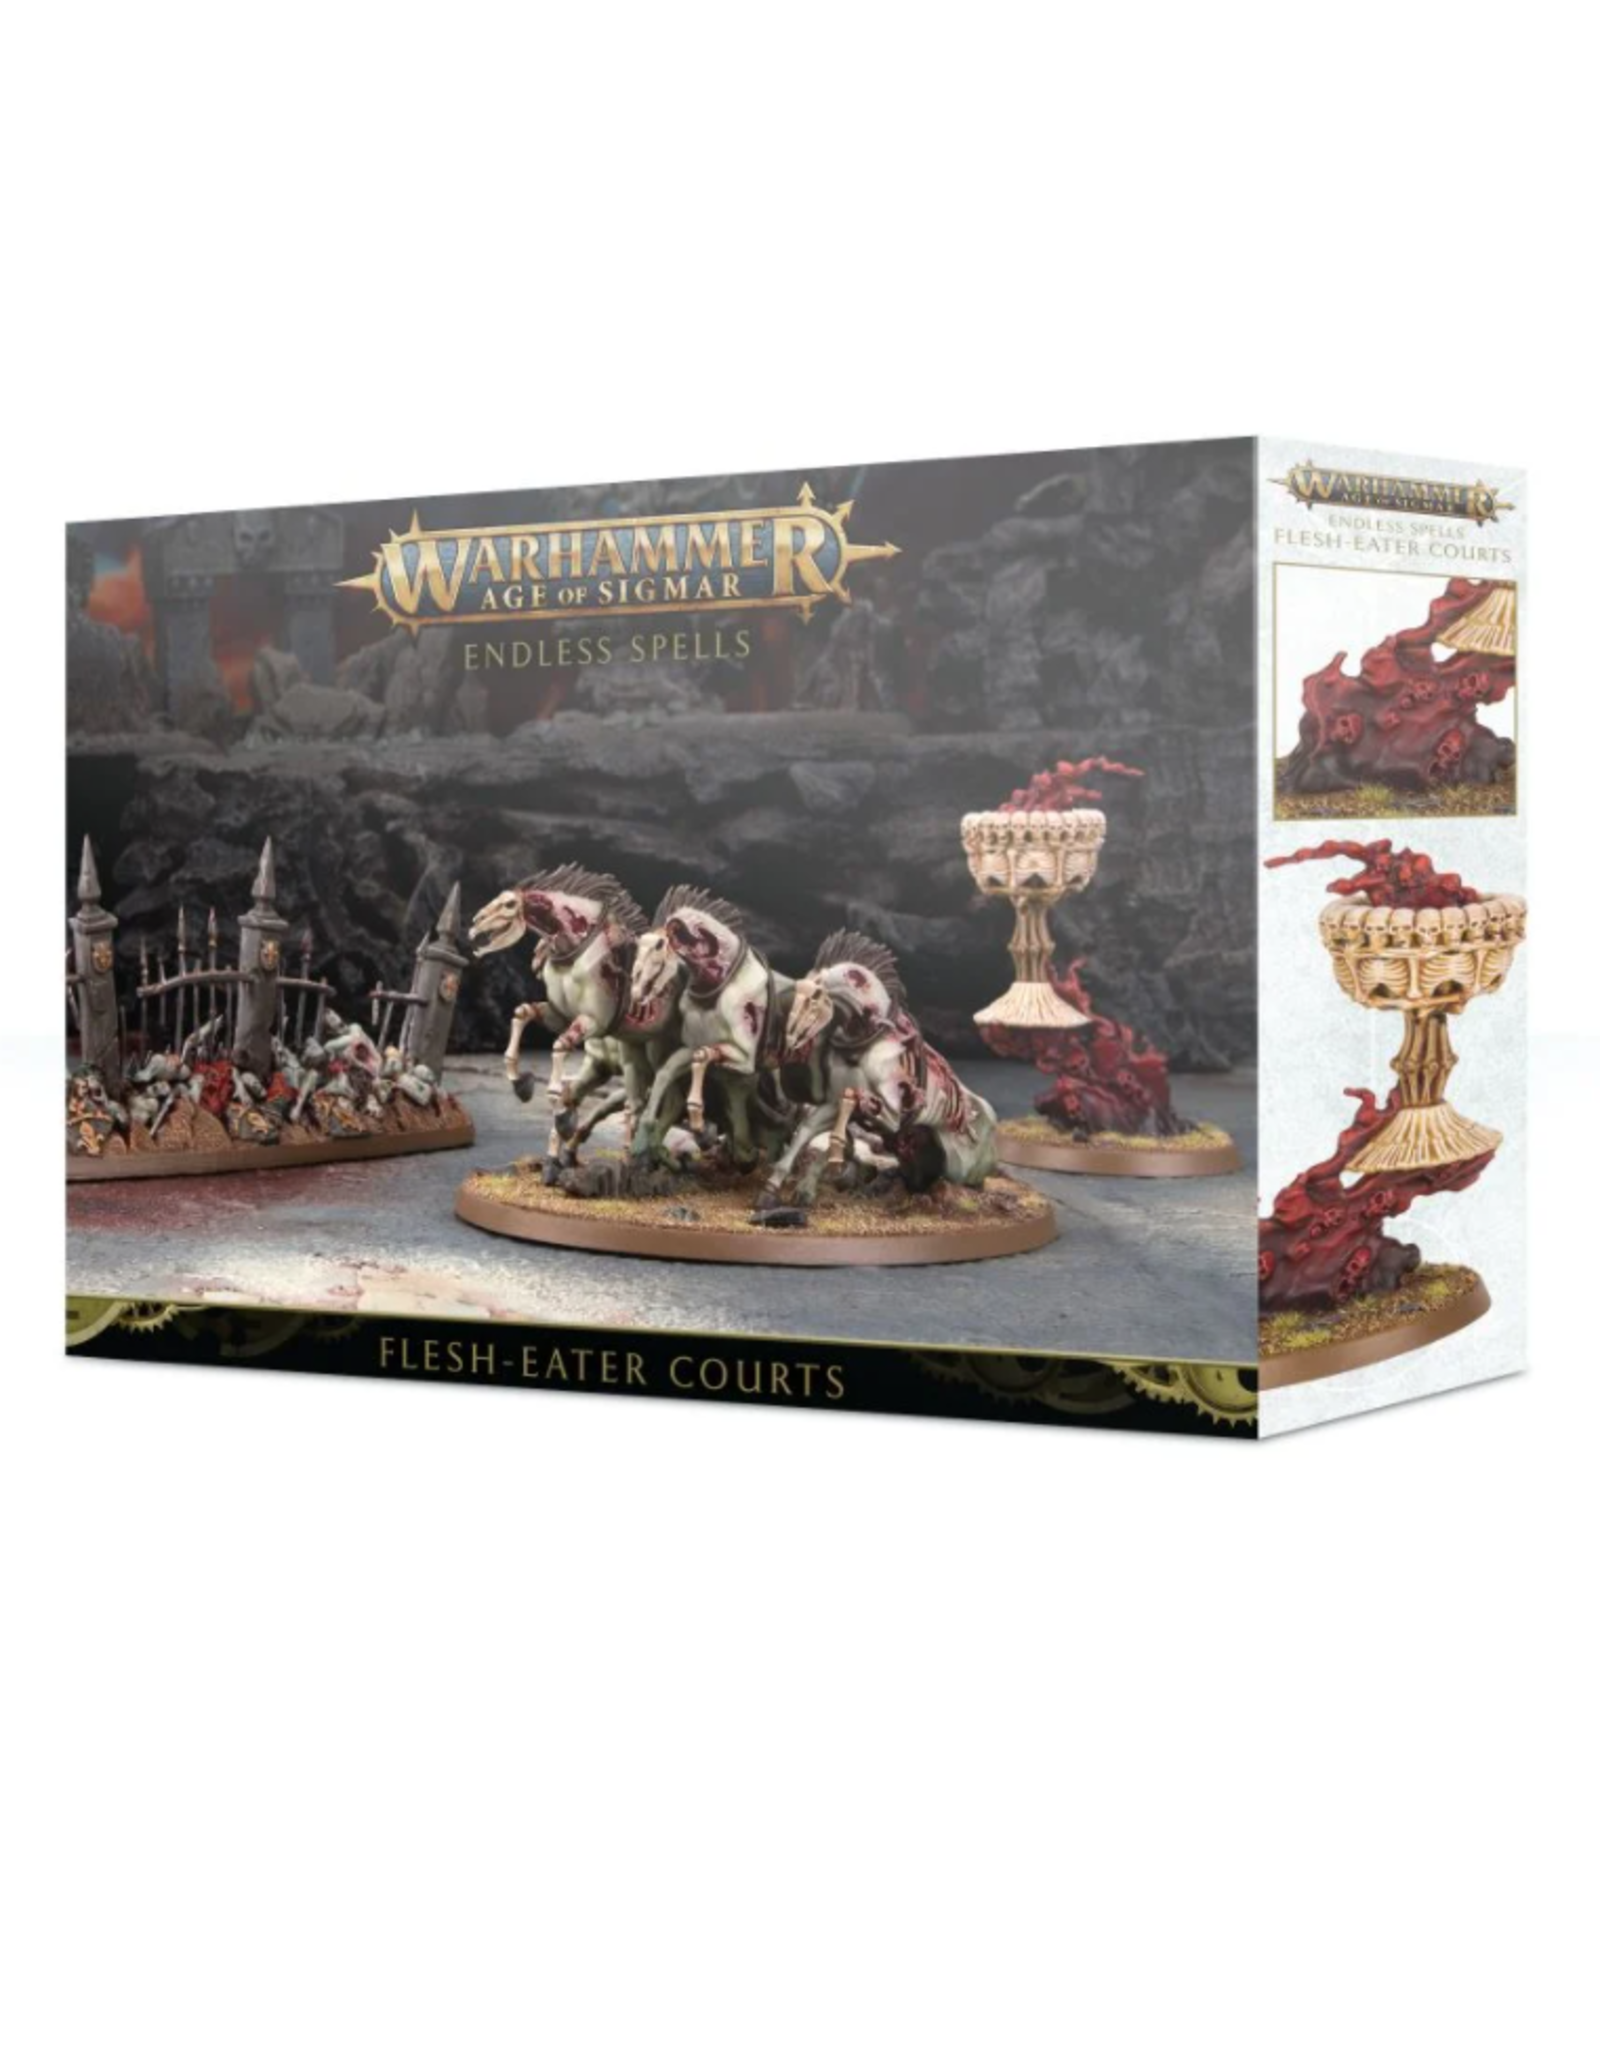 Games Workshop Warhammer Age of Sigmar: Endless Spells Flesh-Eater Courts